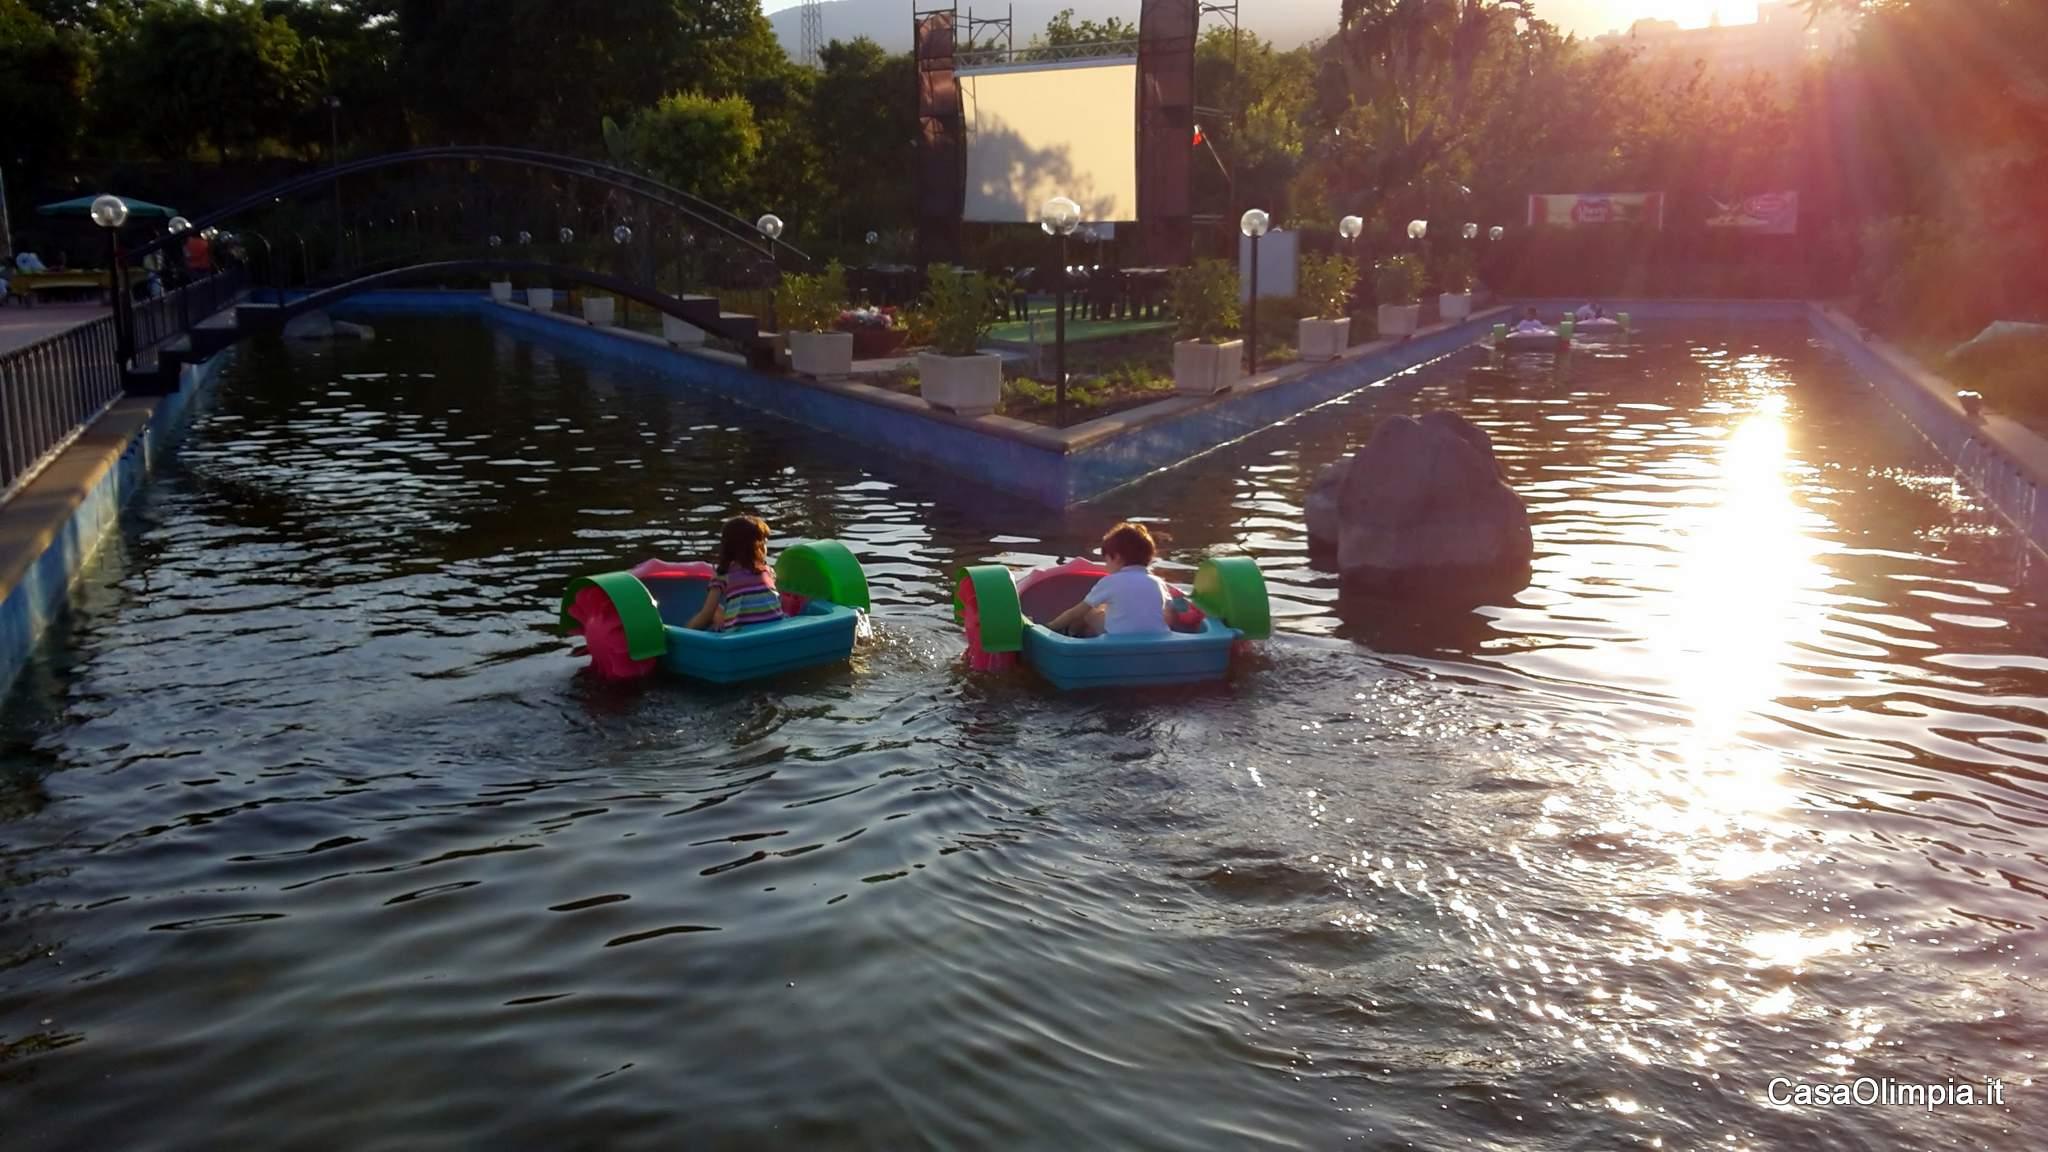 Parque infantil con piscina barcos de juguete y un mont n for Hoteles familiares con piscina